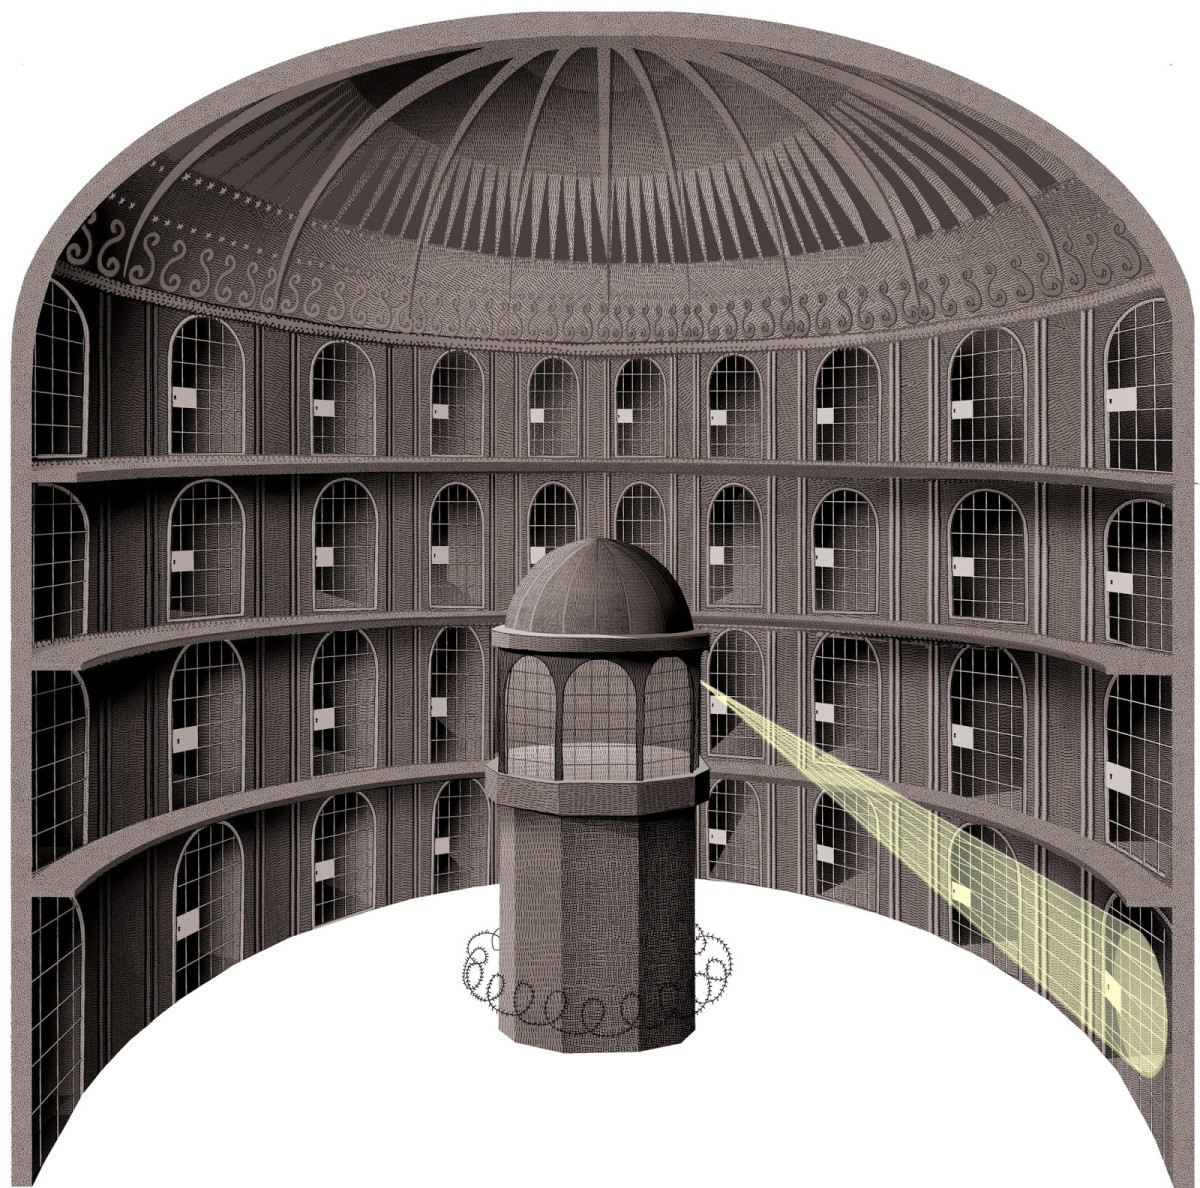 Bentham's dream of control: the Panopticon